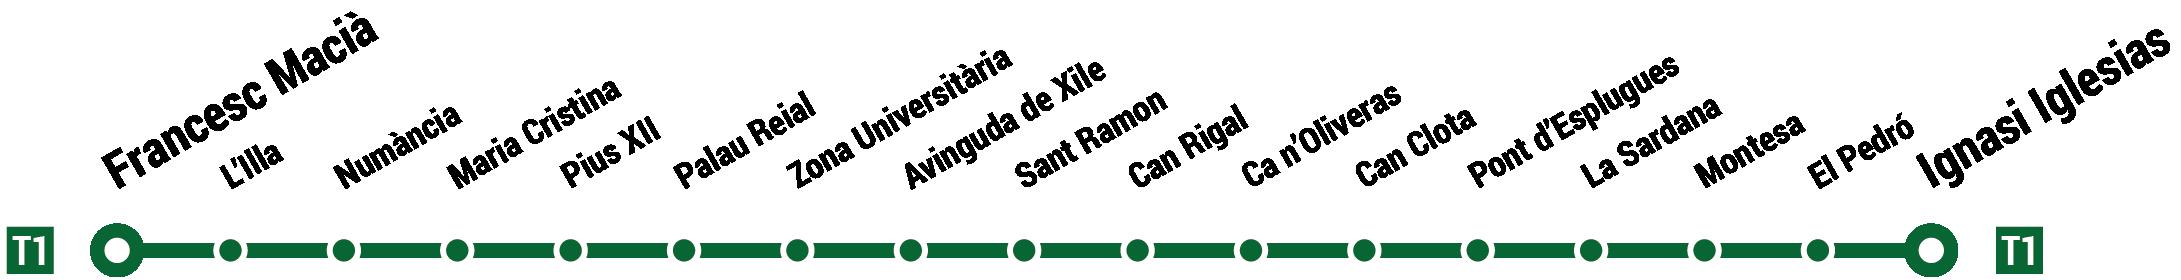 EstacionesTRAM01